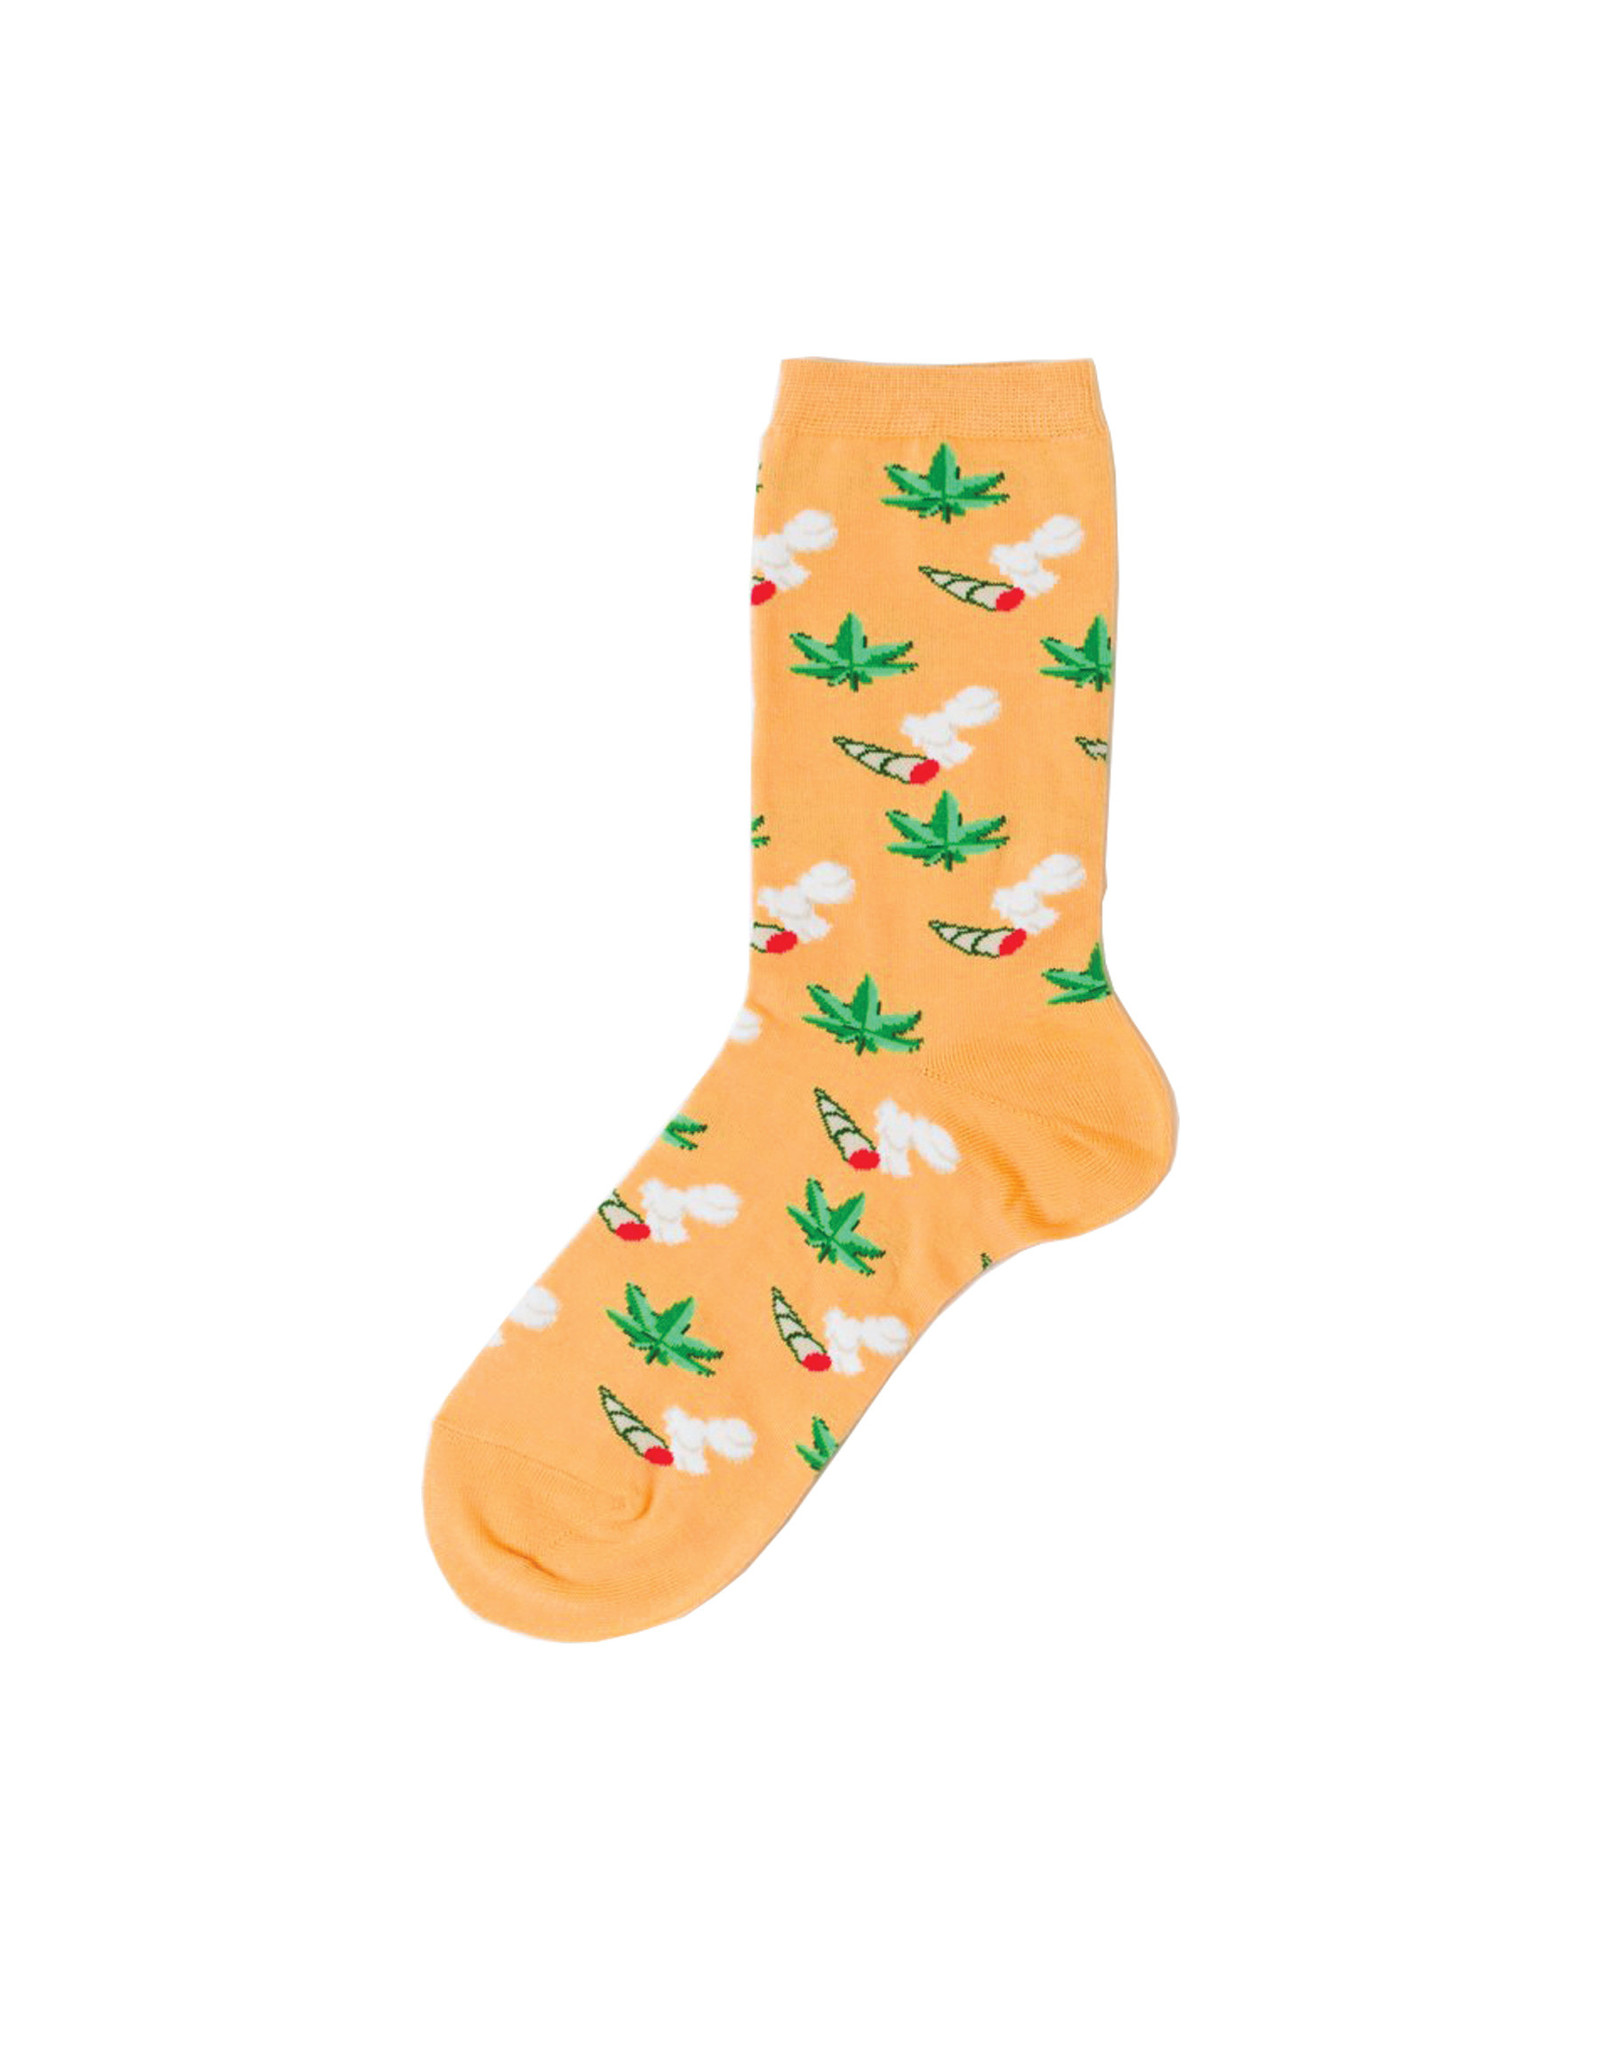 Yellow Owl Orange Weed Socks, S-M